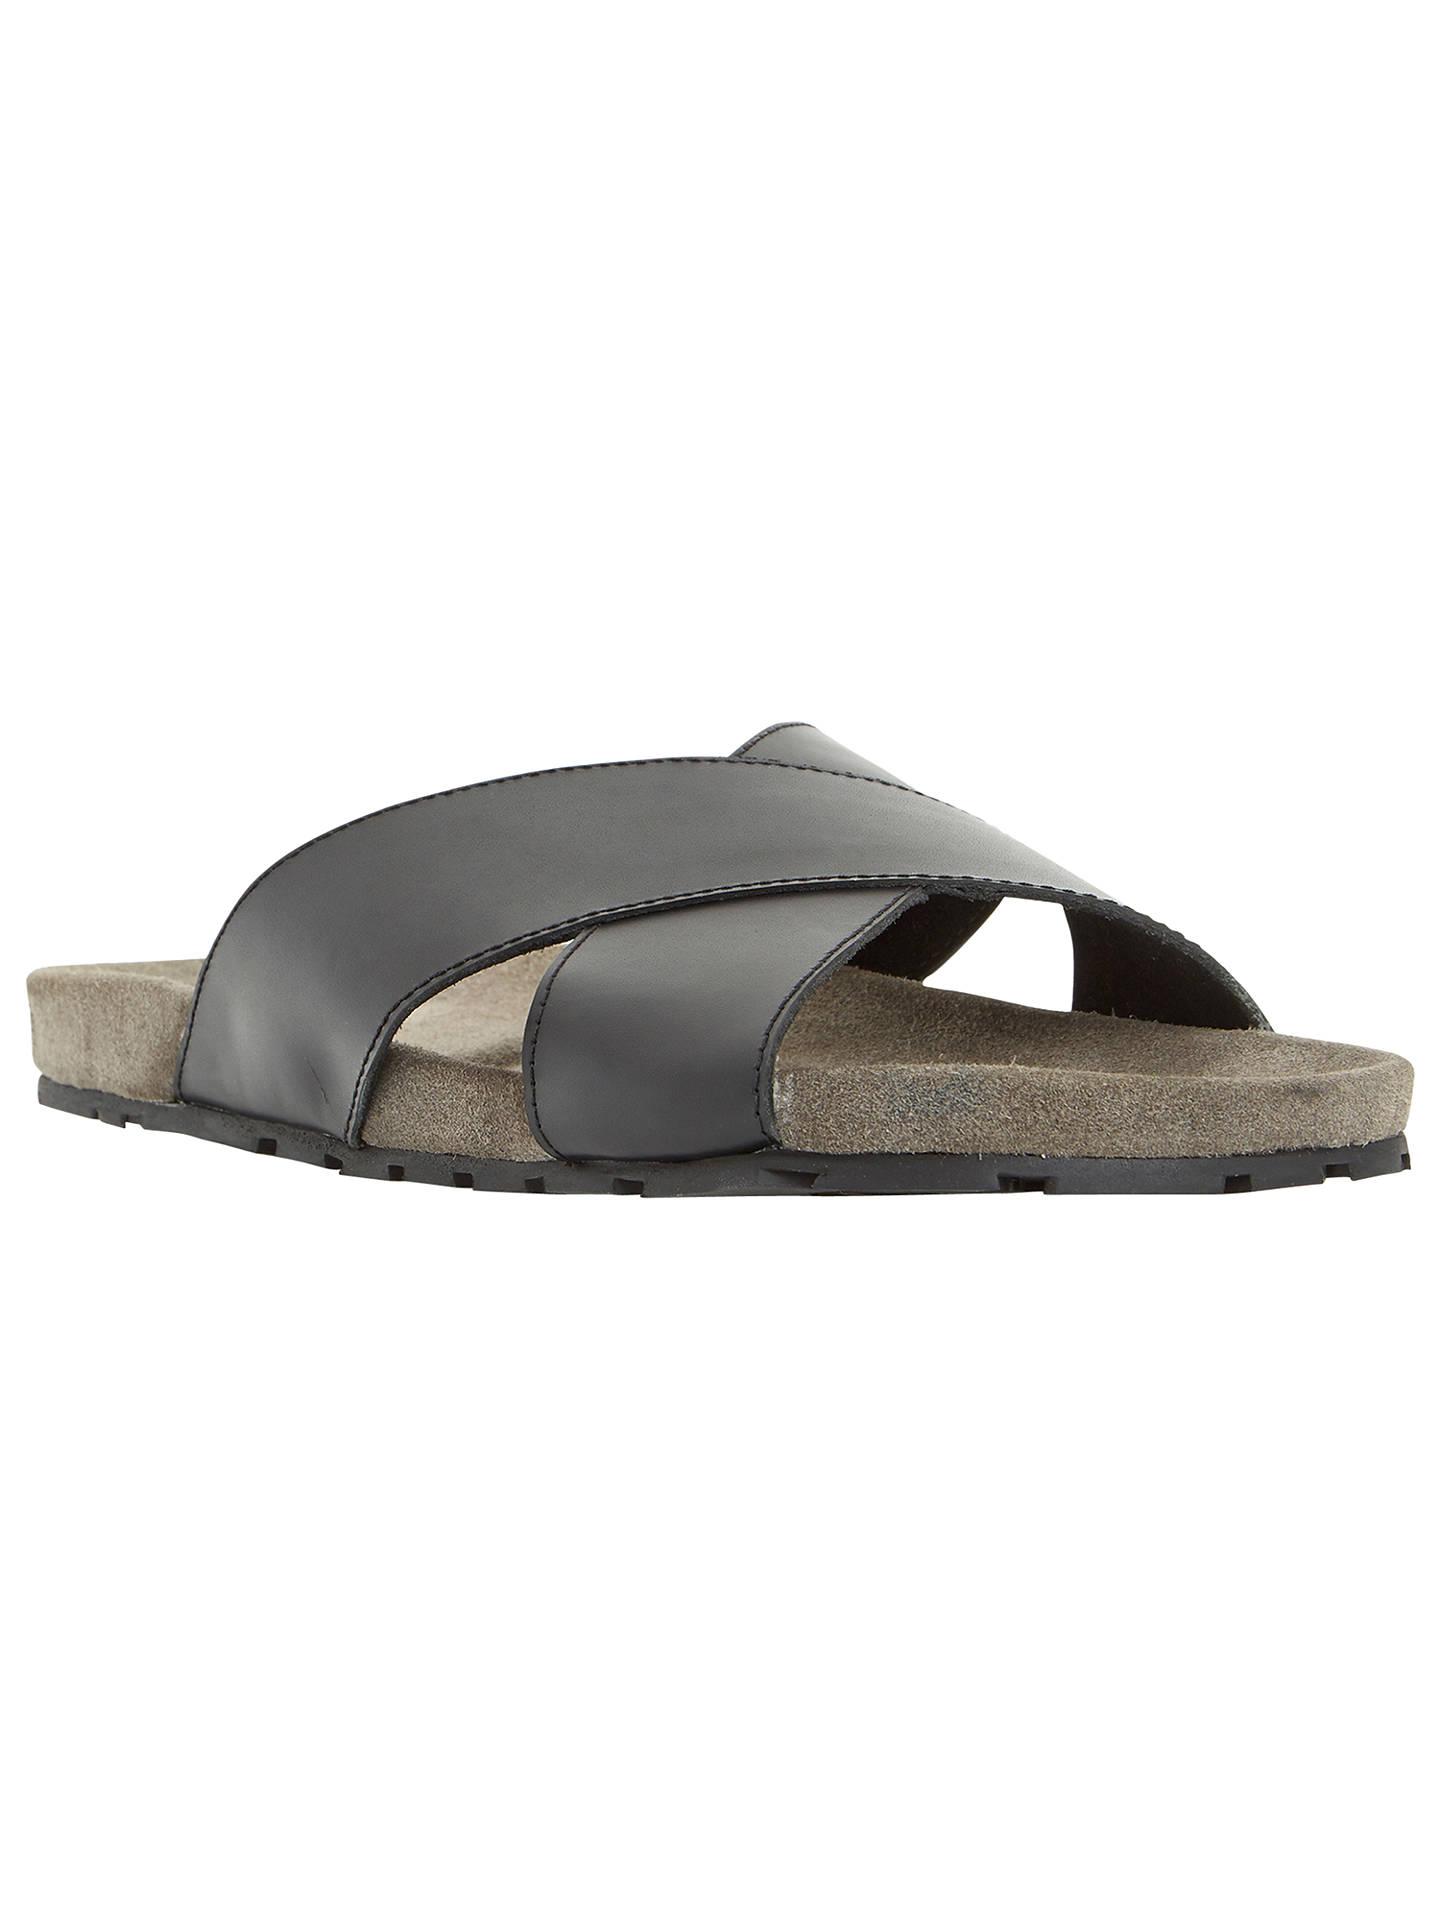 6d3975779396d Buy Dune Idris Leather Crossover Strap Sandals, Black, 40 Online at  johnlewis.com ...